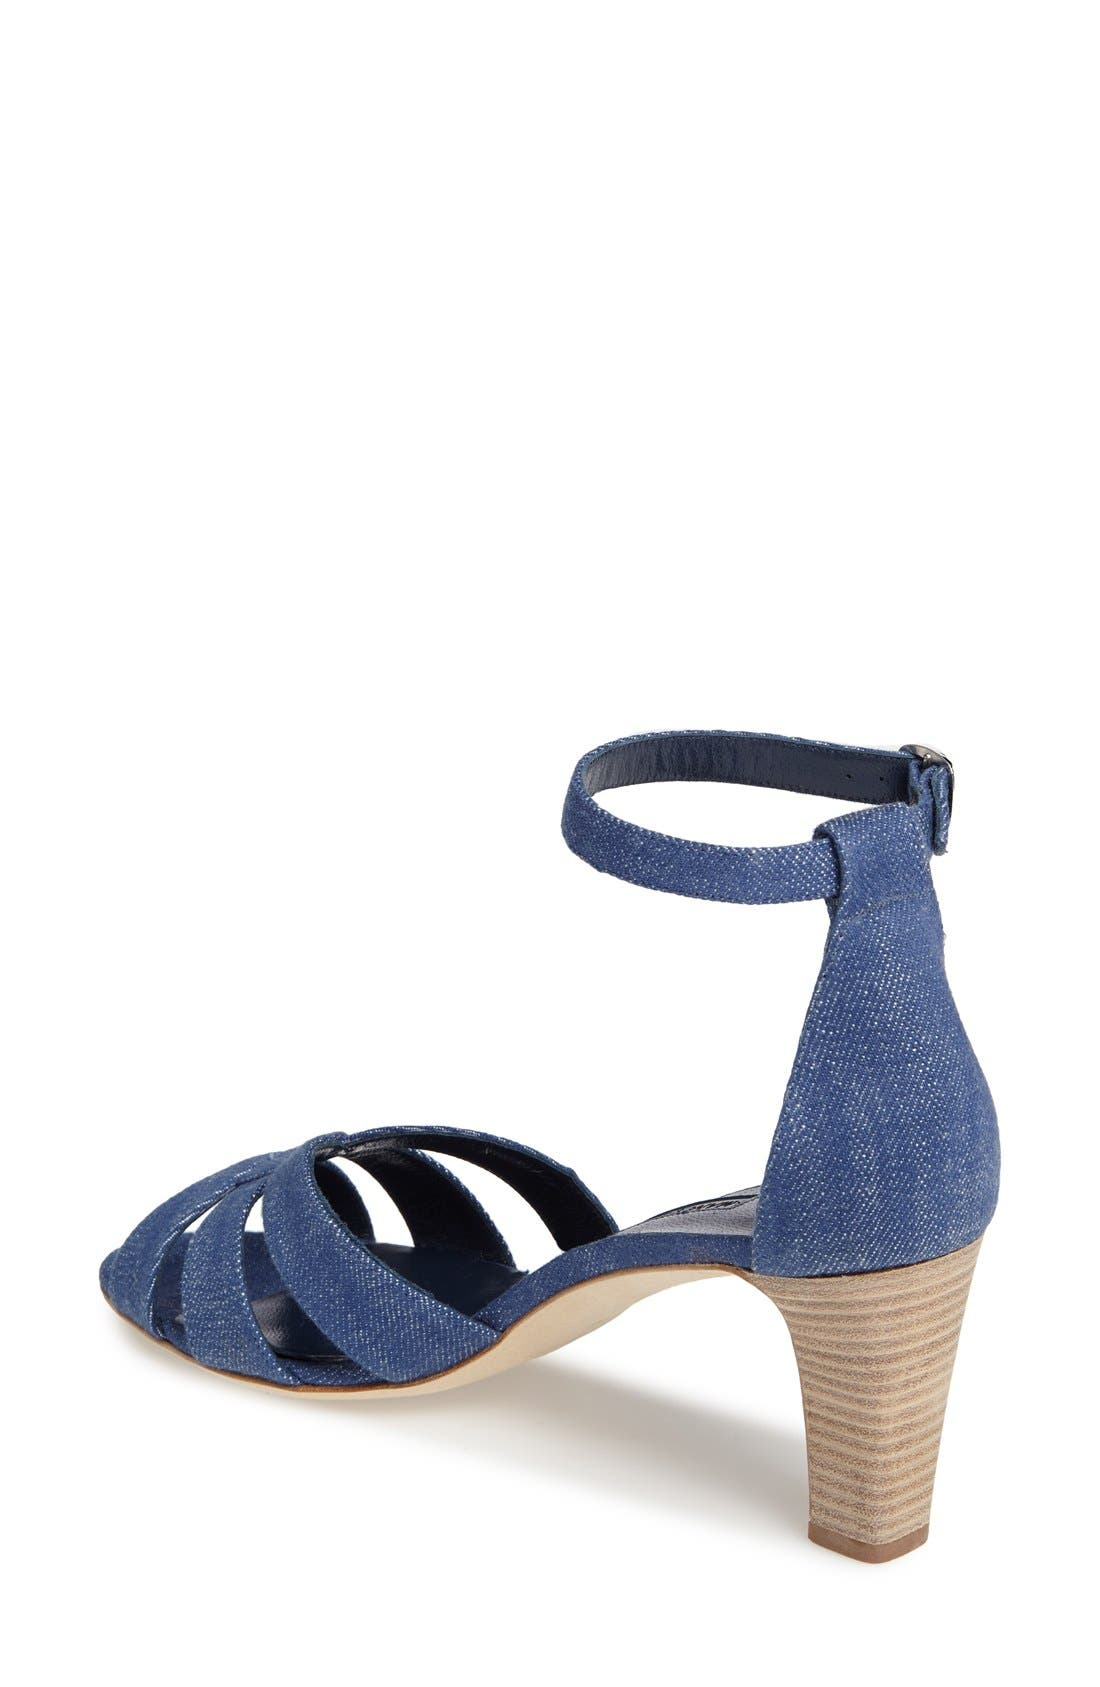 Alternate Image 2  - Manolo Blahnik Unista Sandal (Women)